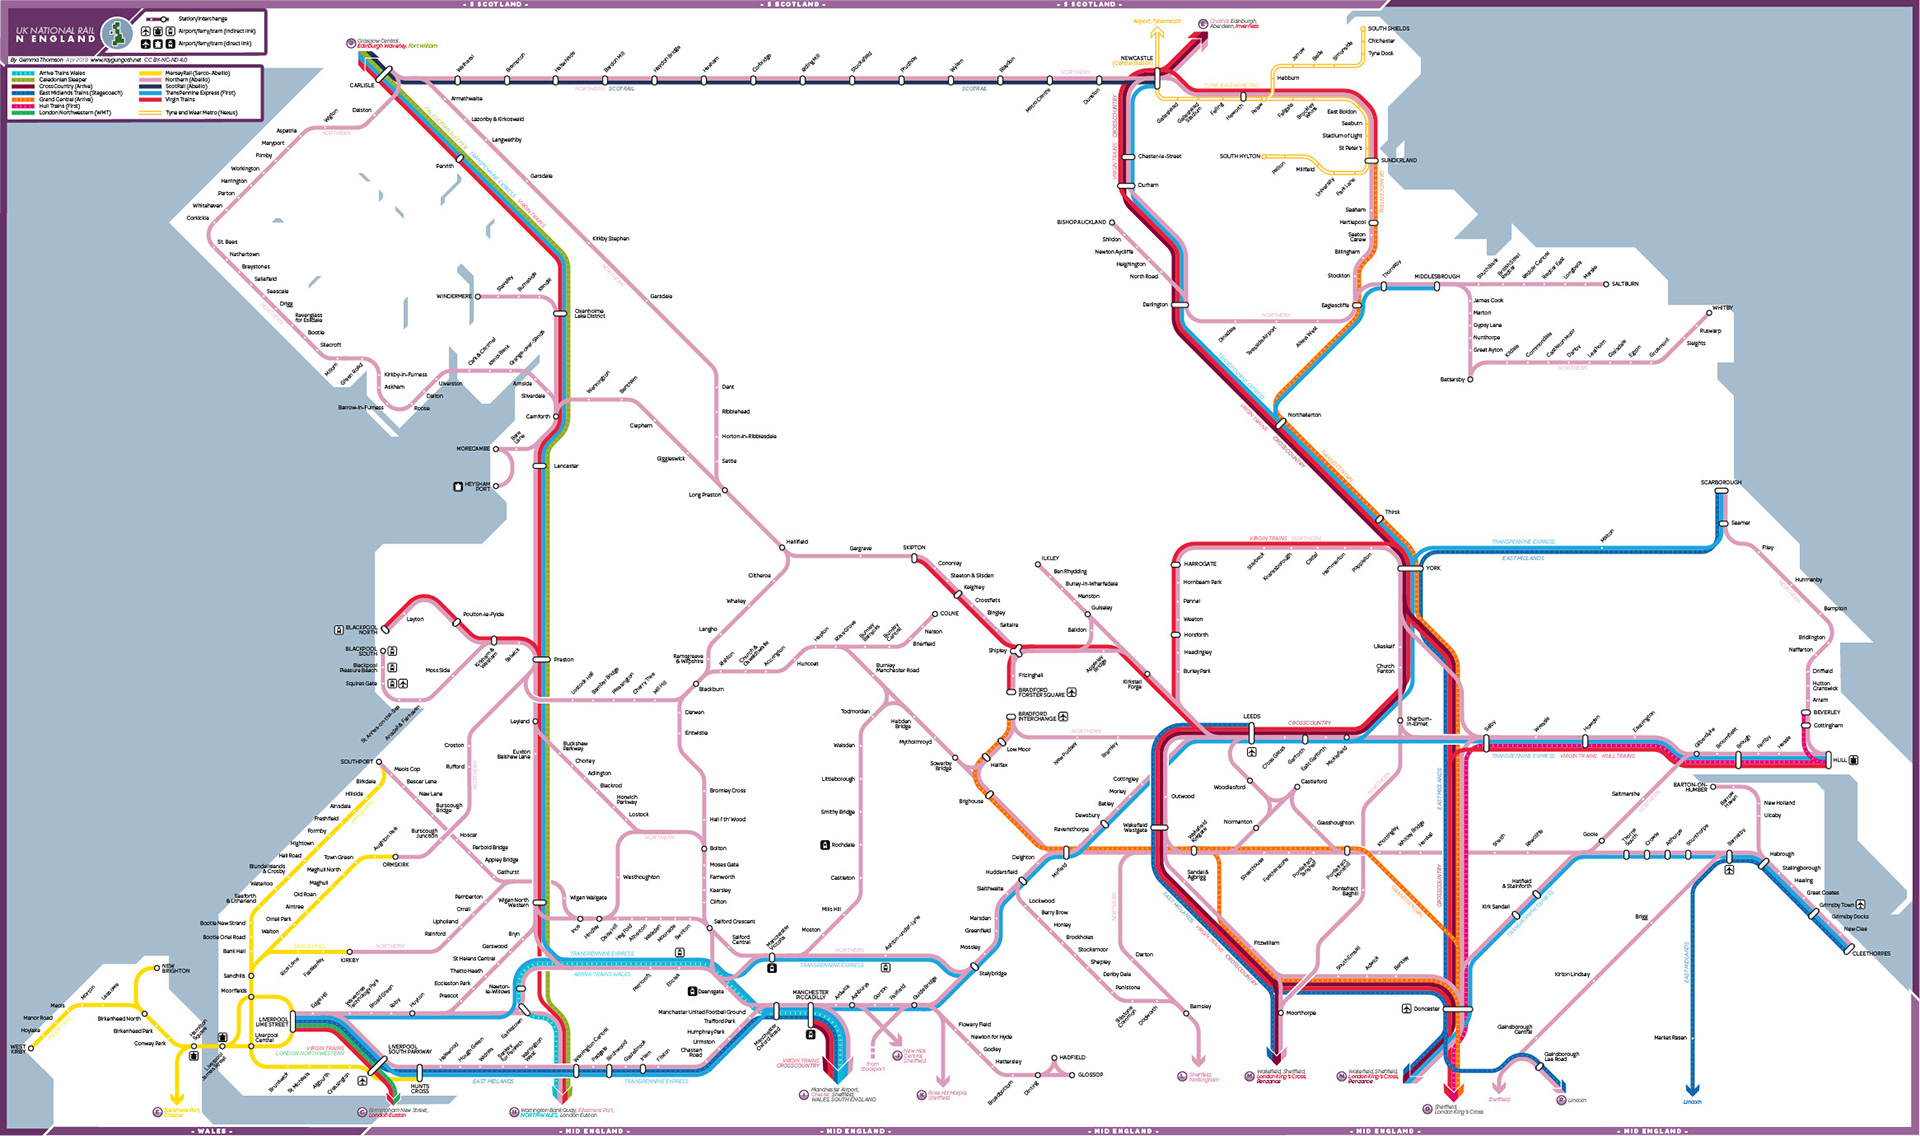 National Rail Uk Map.Gemma Thomson Uk National Rail Maps